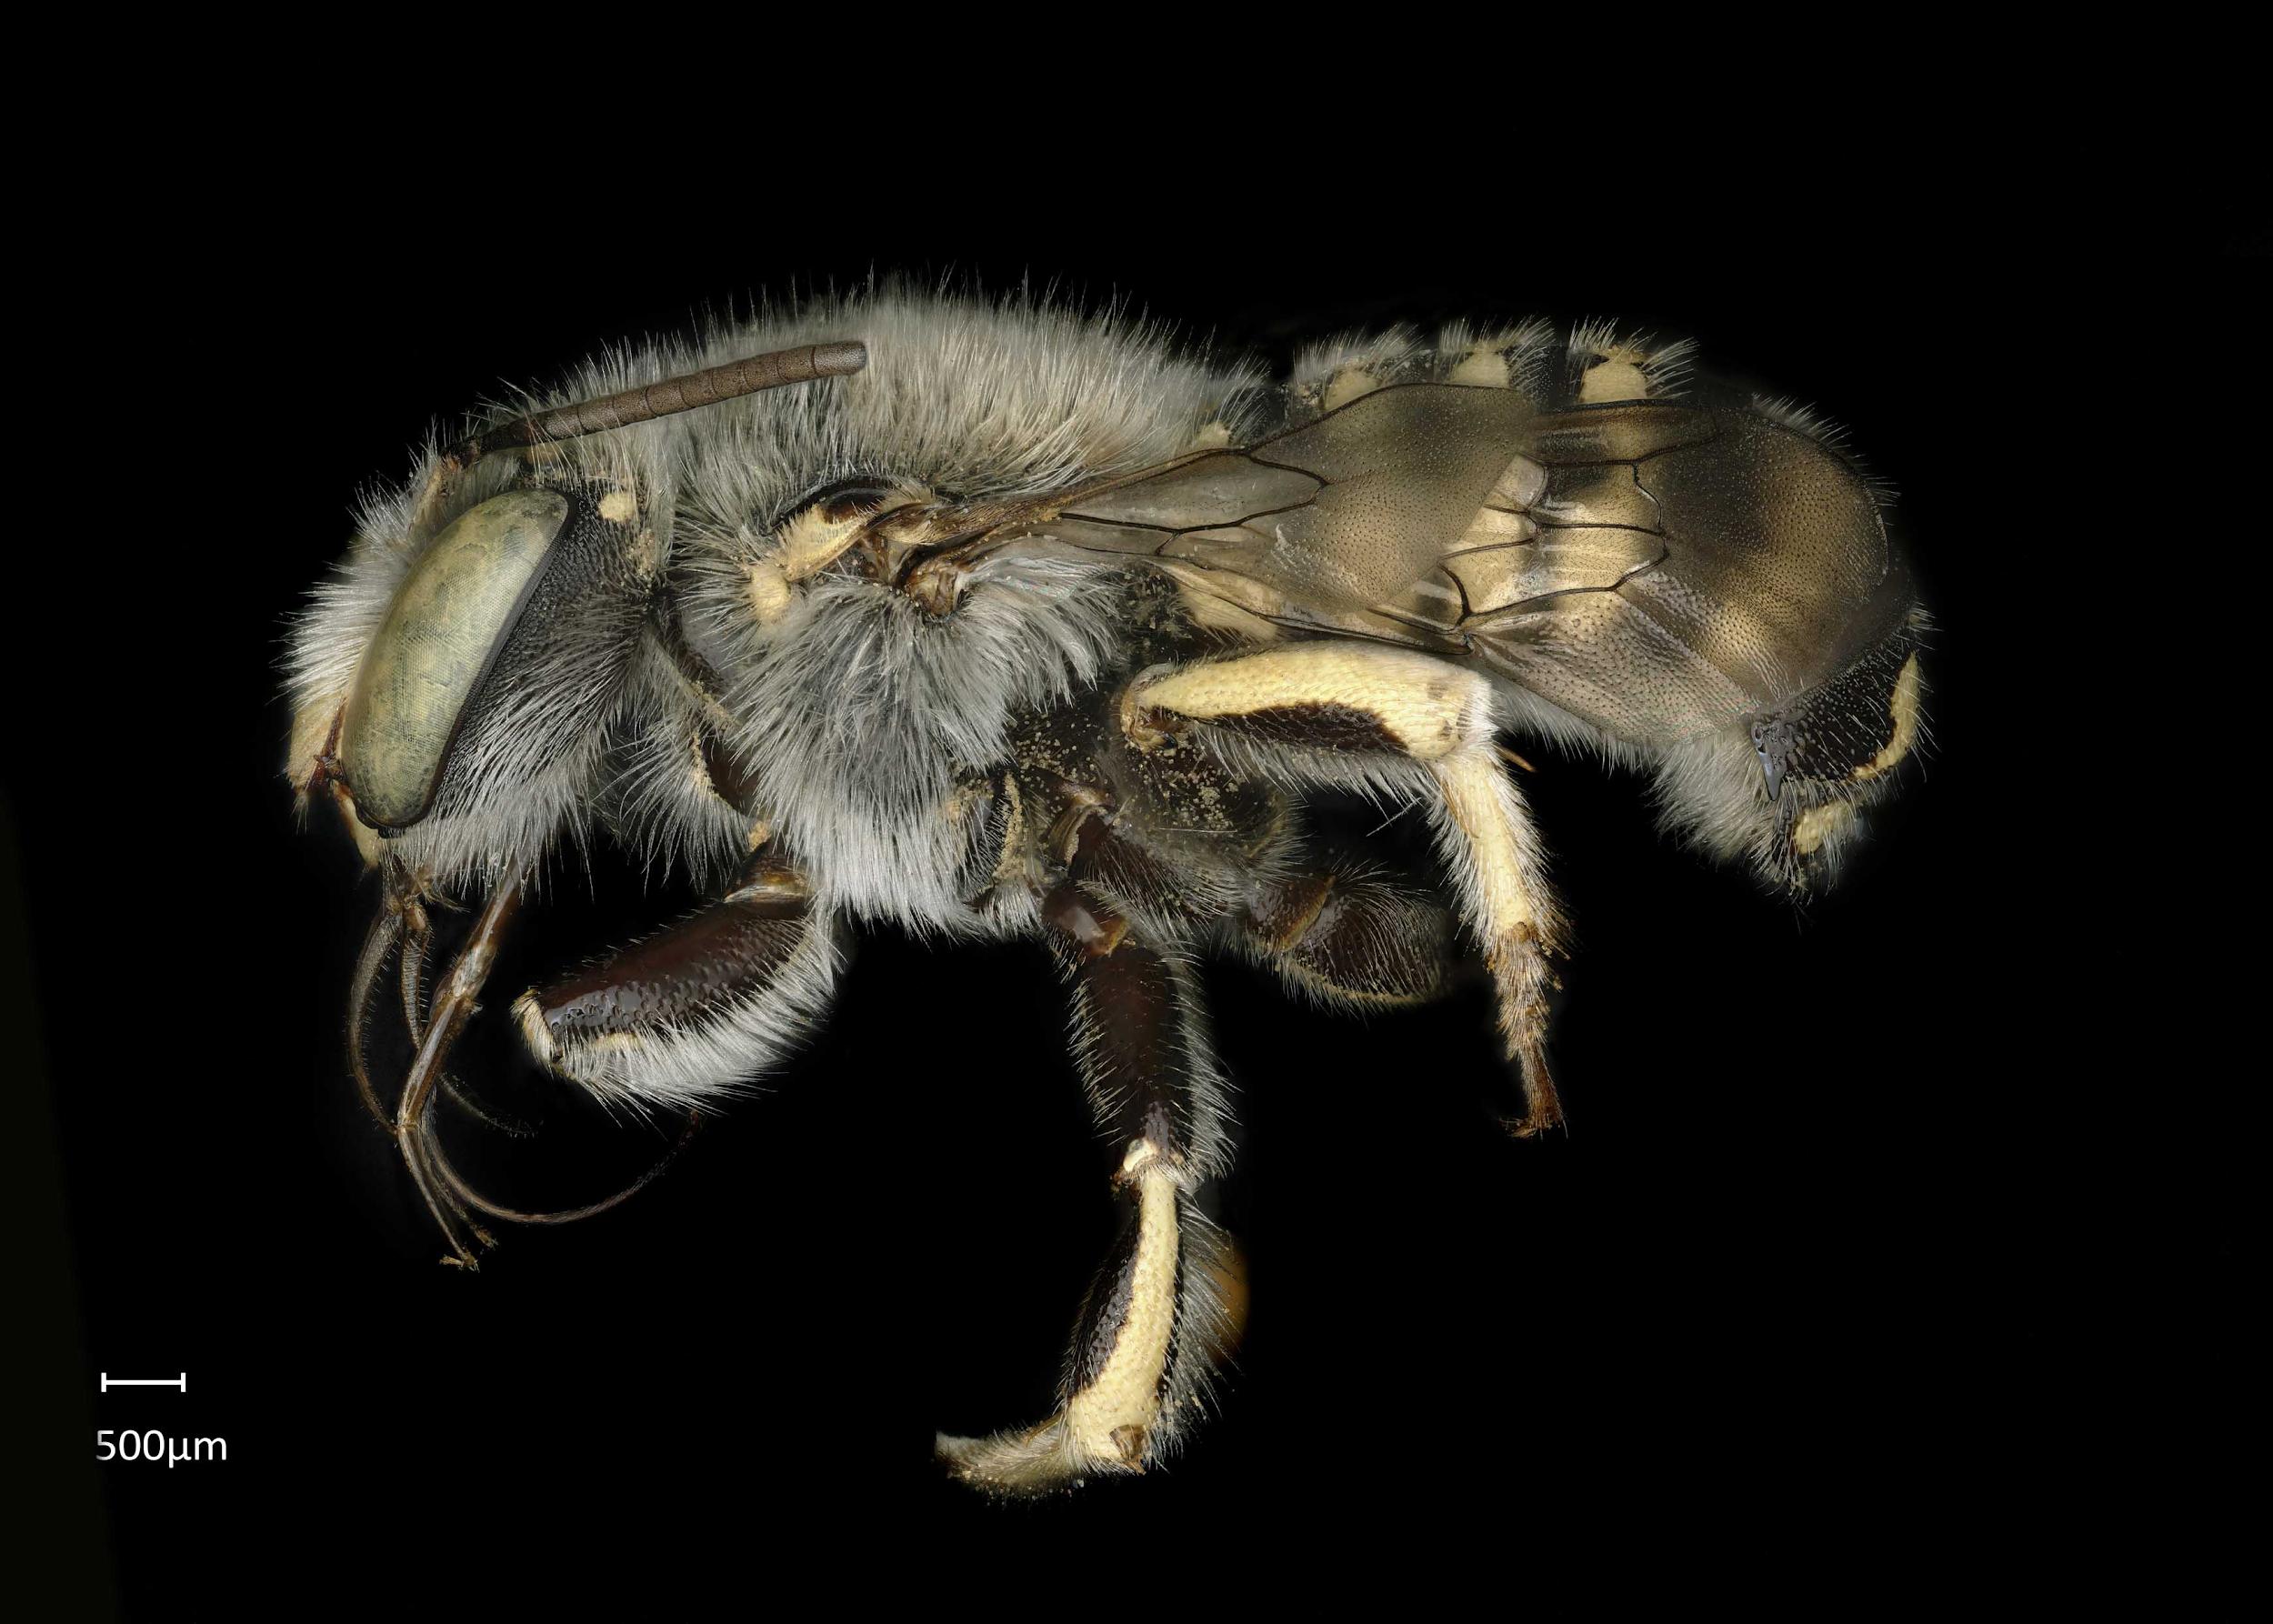 Wool carder bee Photo credi: Jeni Sidwell